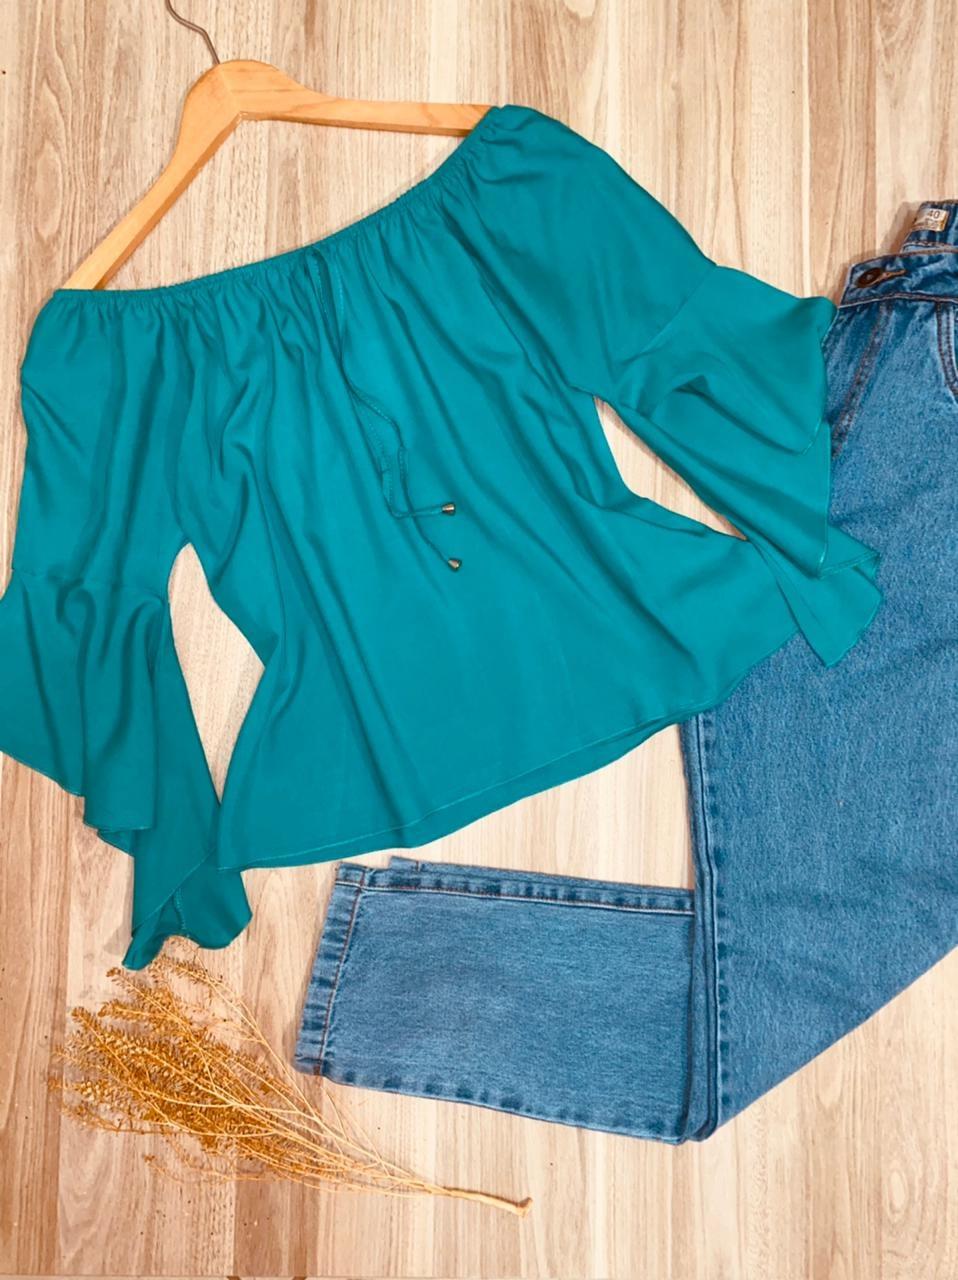 Blusa Ciganinha LB Manga 3 4 Verde Claro